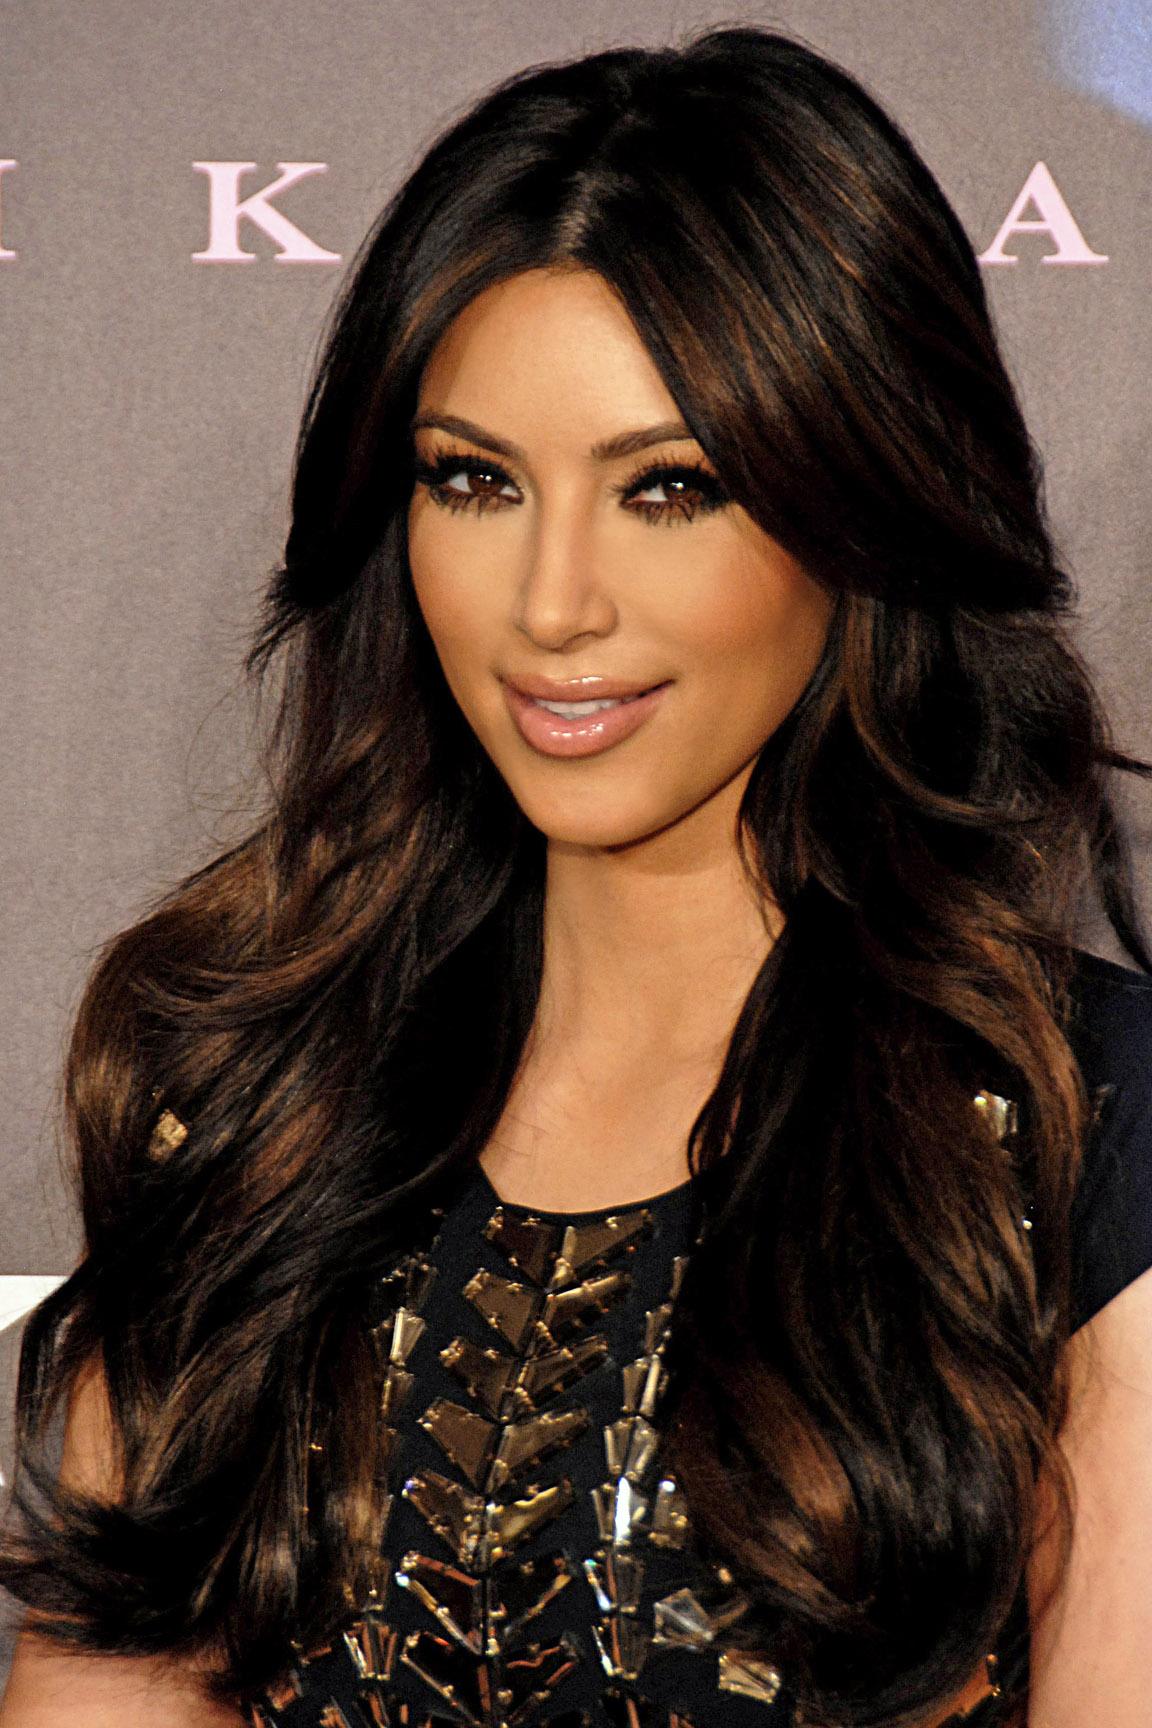 Kim_Kardashian_2011.jpg (1152×1728)